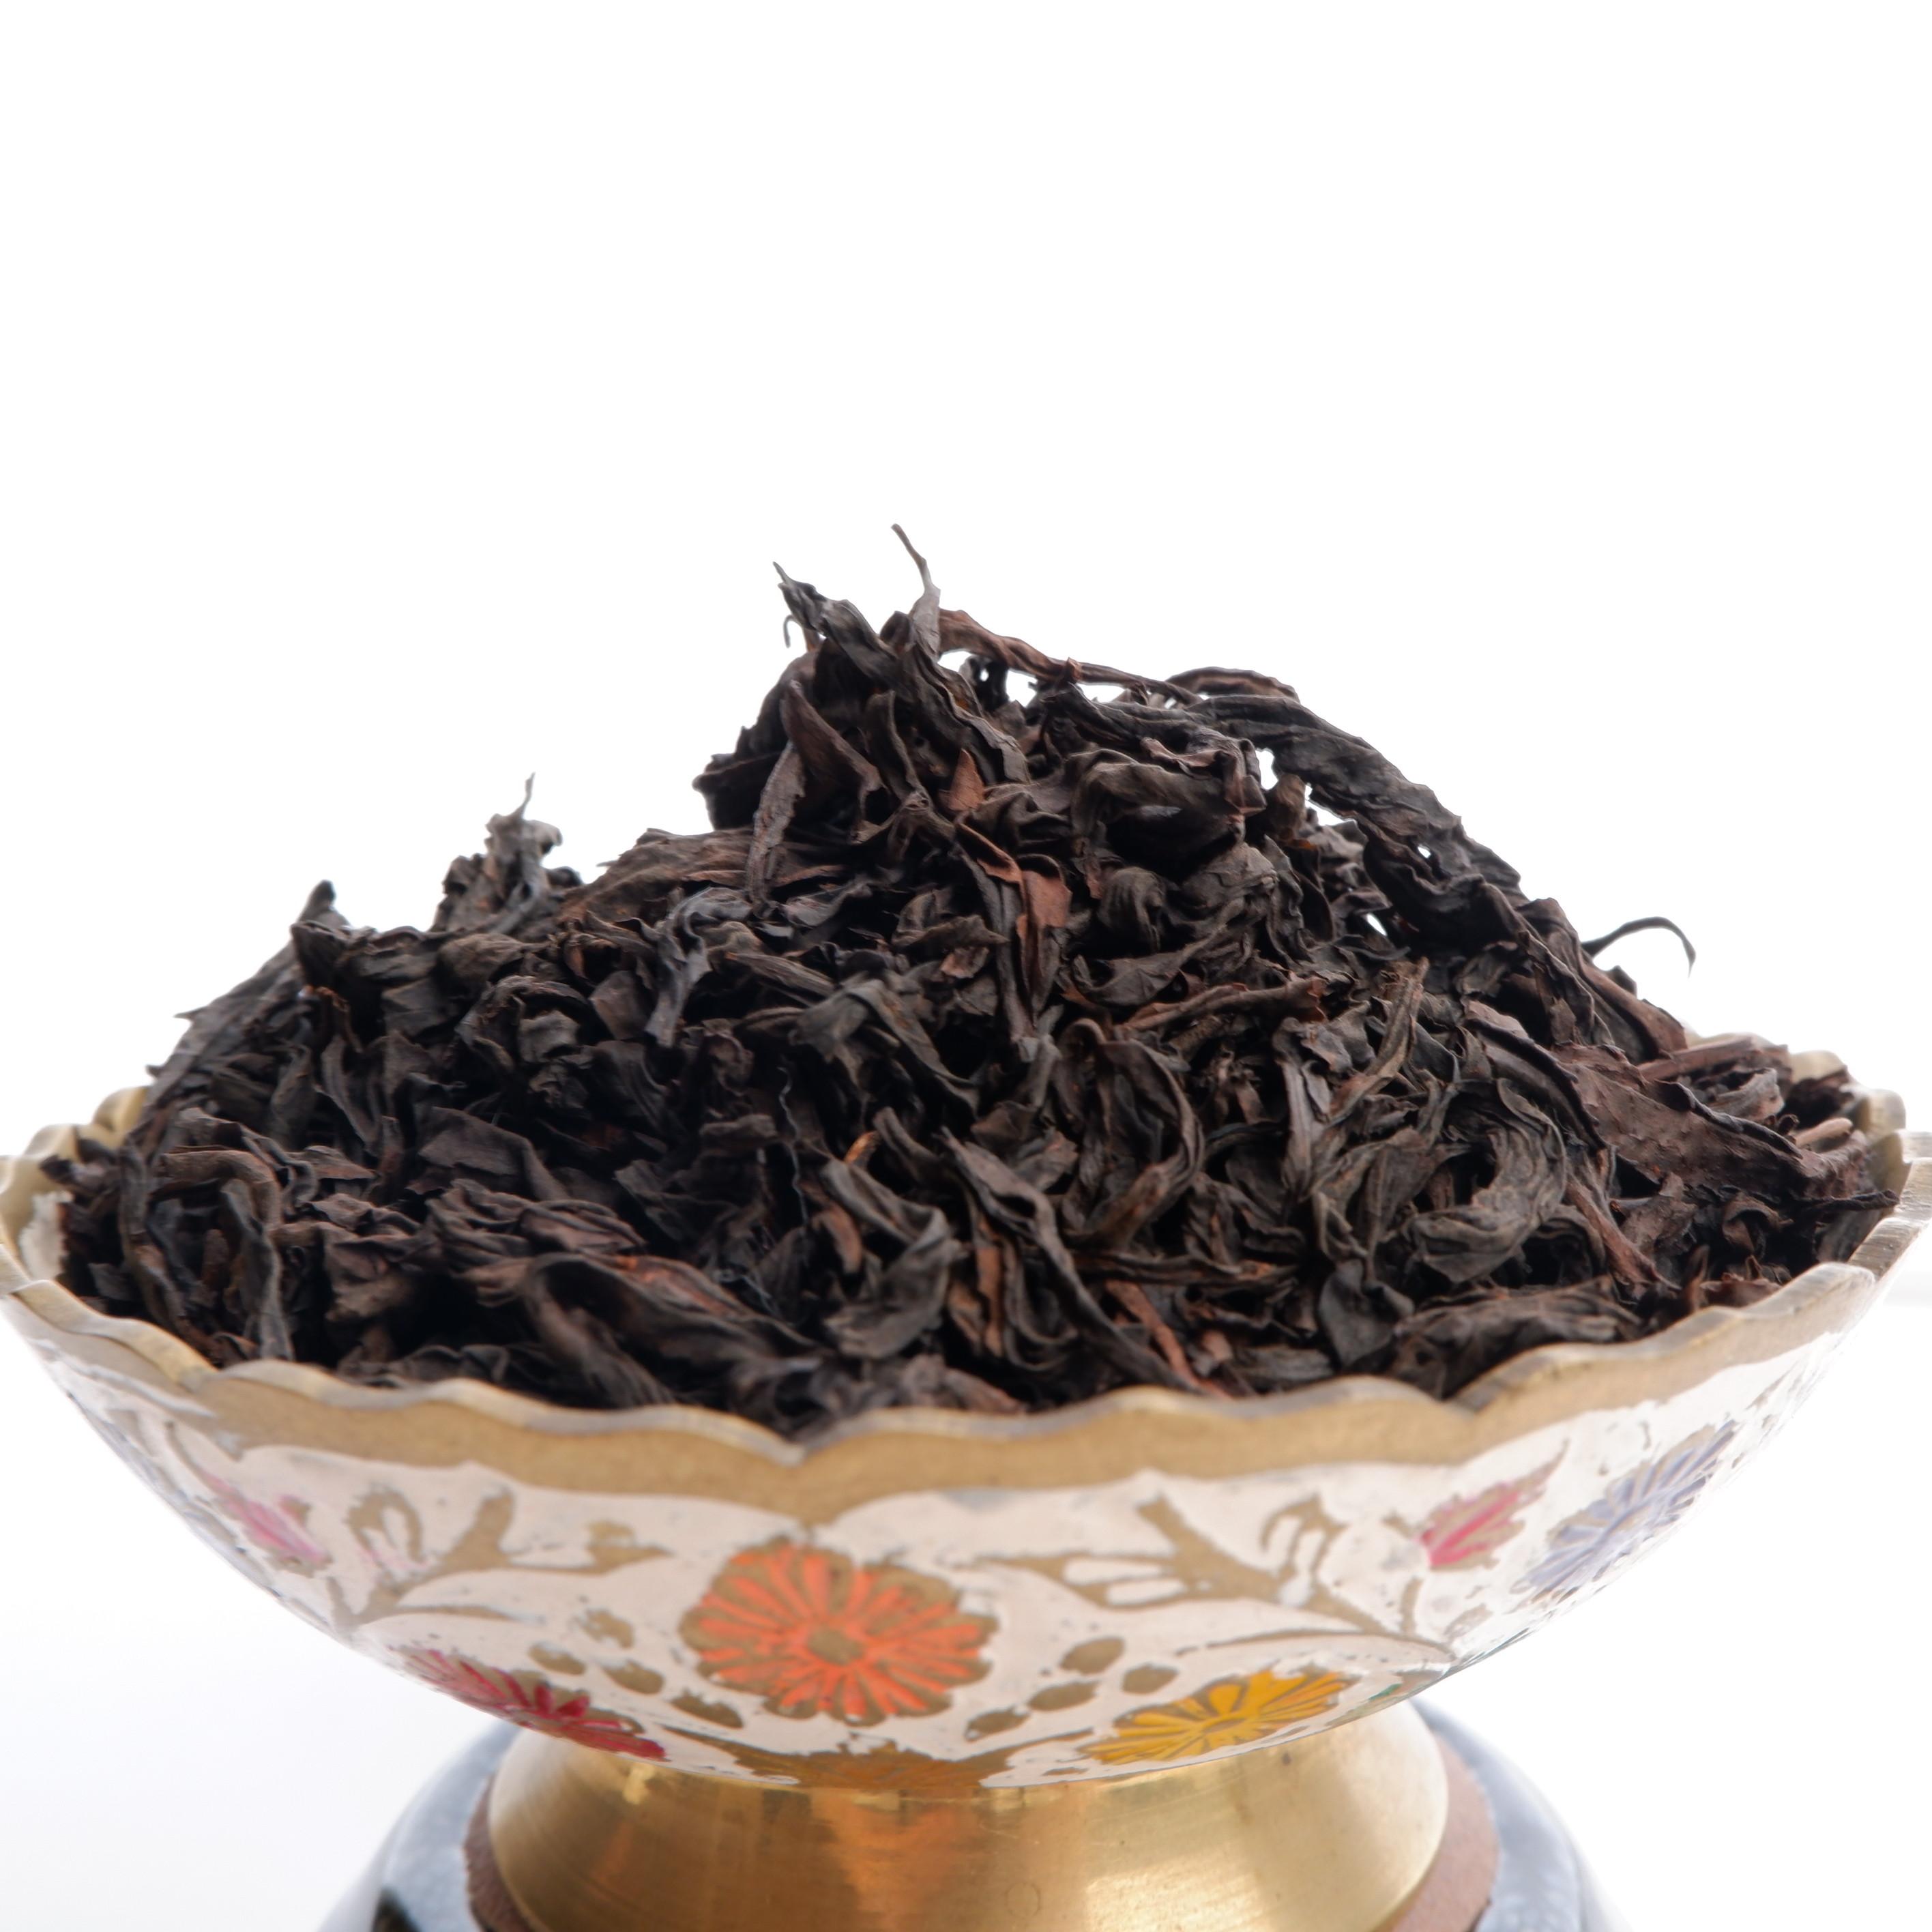 2020 New Promotion Healthy Drink Loose Leaf Oolong Tea - 4uTea | 4uTea.com